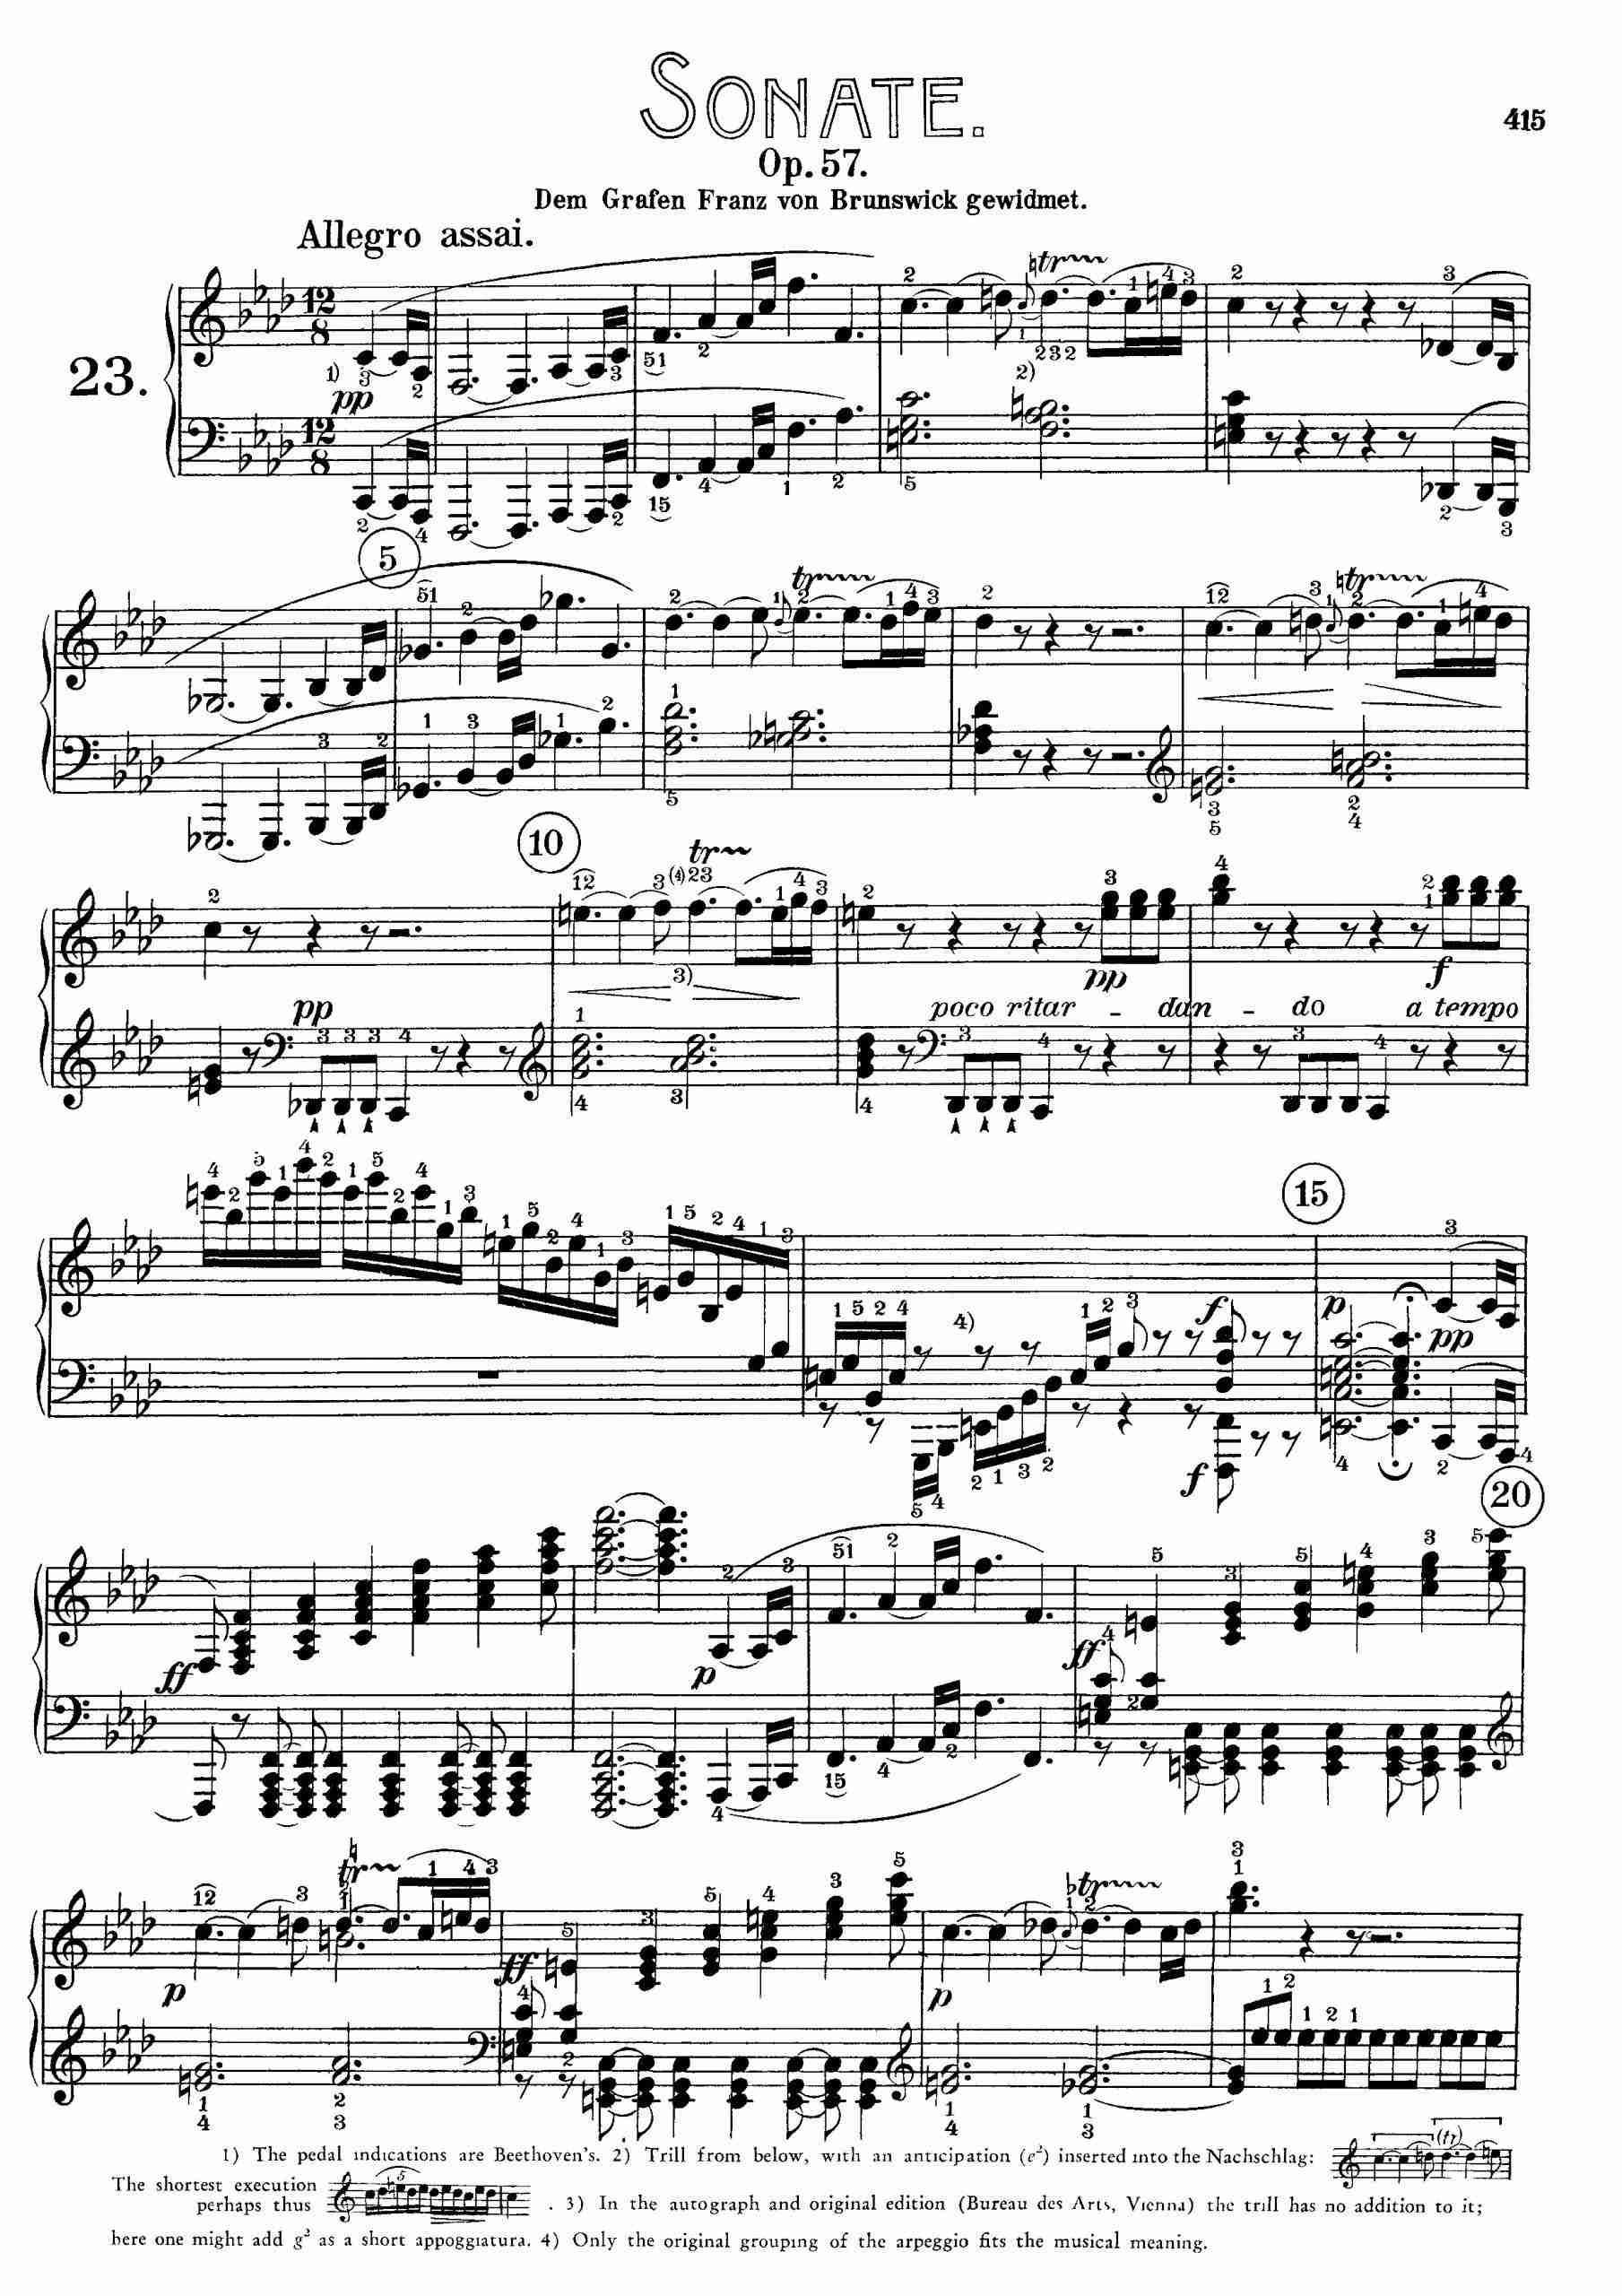 Beethoven, Ludwig van - Piano Sonata No.23, Op.57